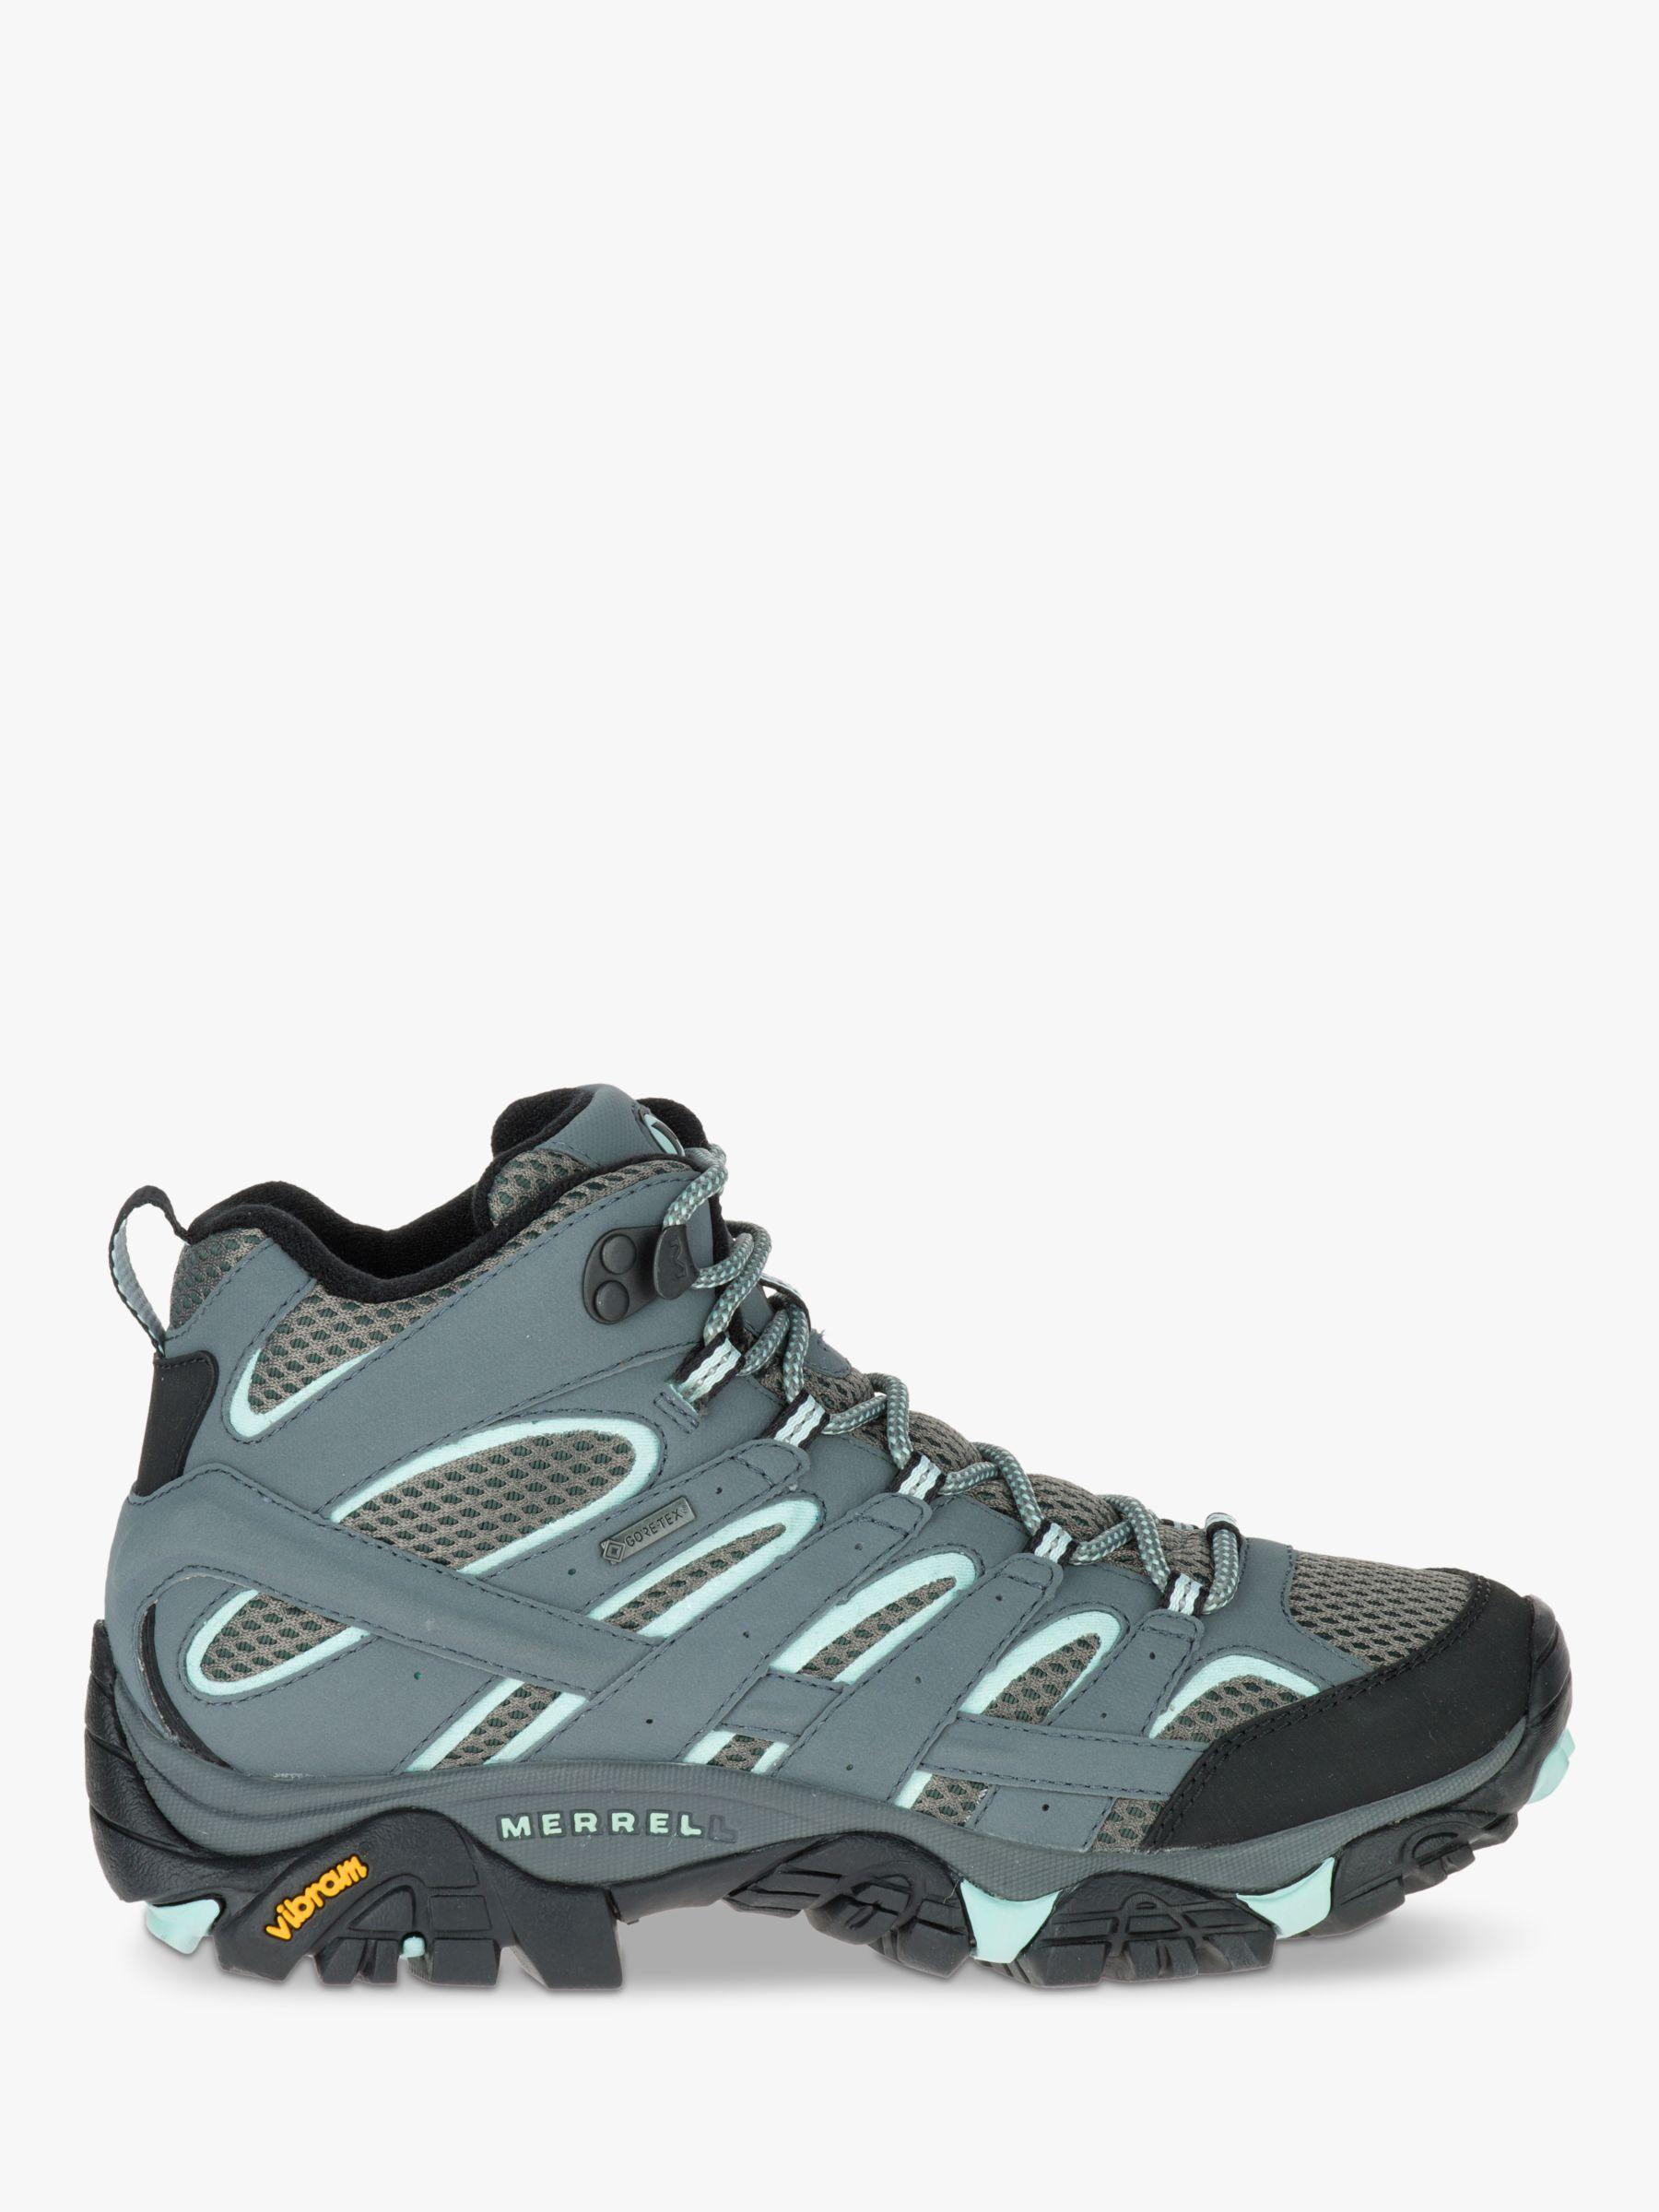 Merrell Merrell MOAB 2 Mid Women's Waterproof Gore-Tex Hiking Boots, Sage